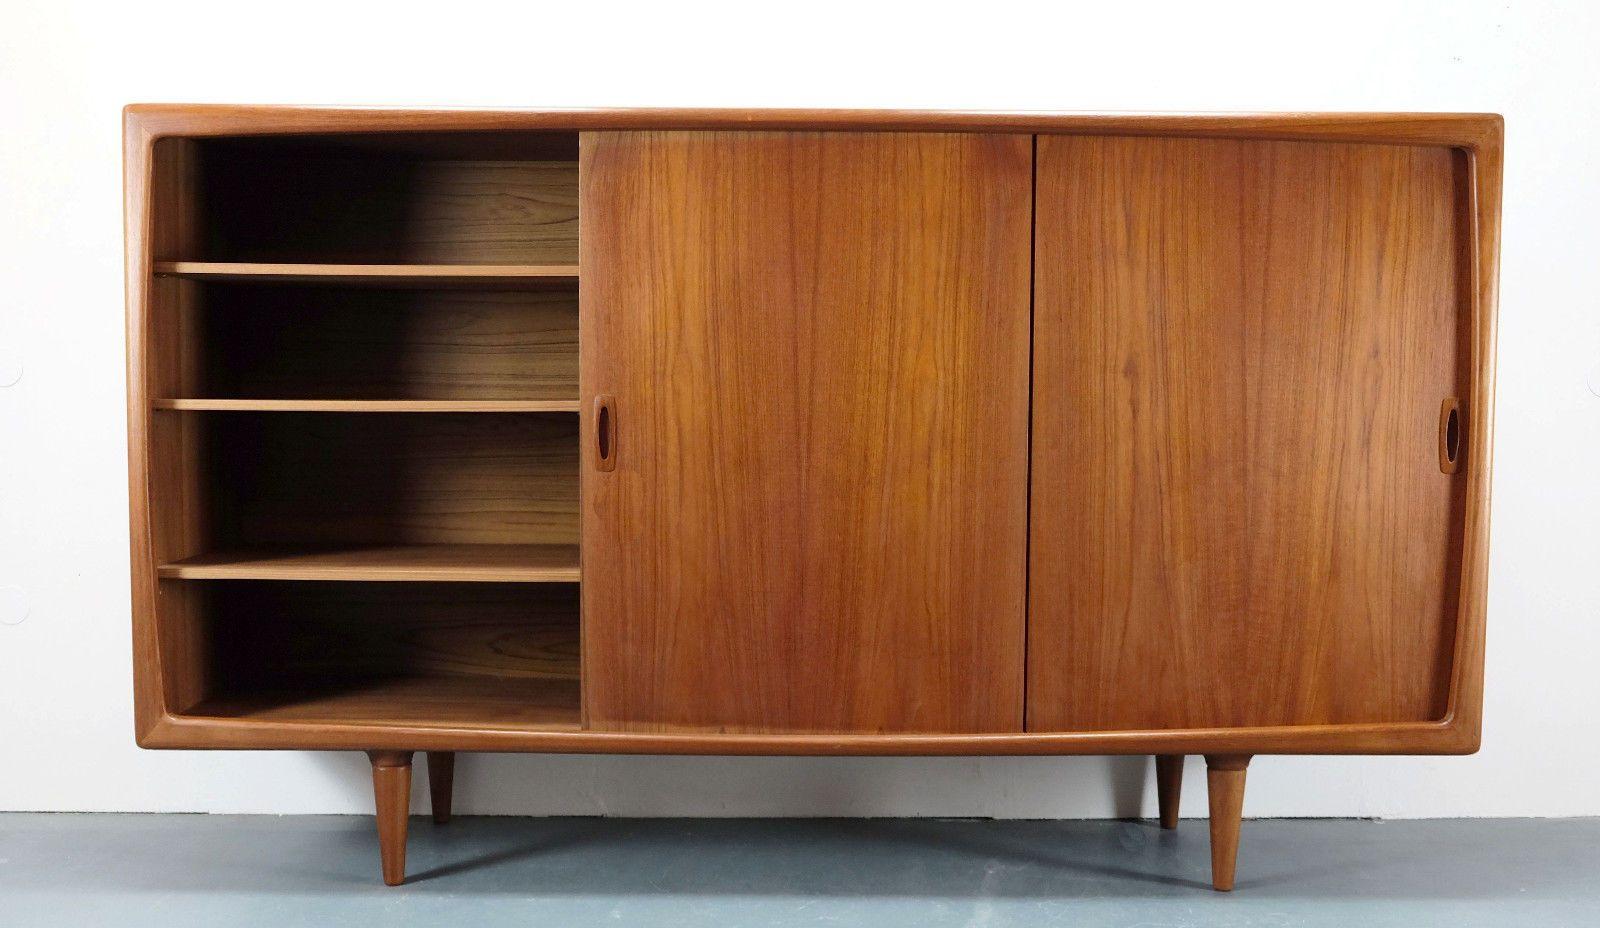 Vintage Danish Modern Teak Credenza from H  P  Hansen for sale at Pamono